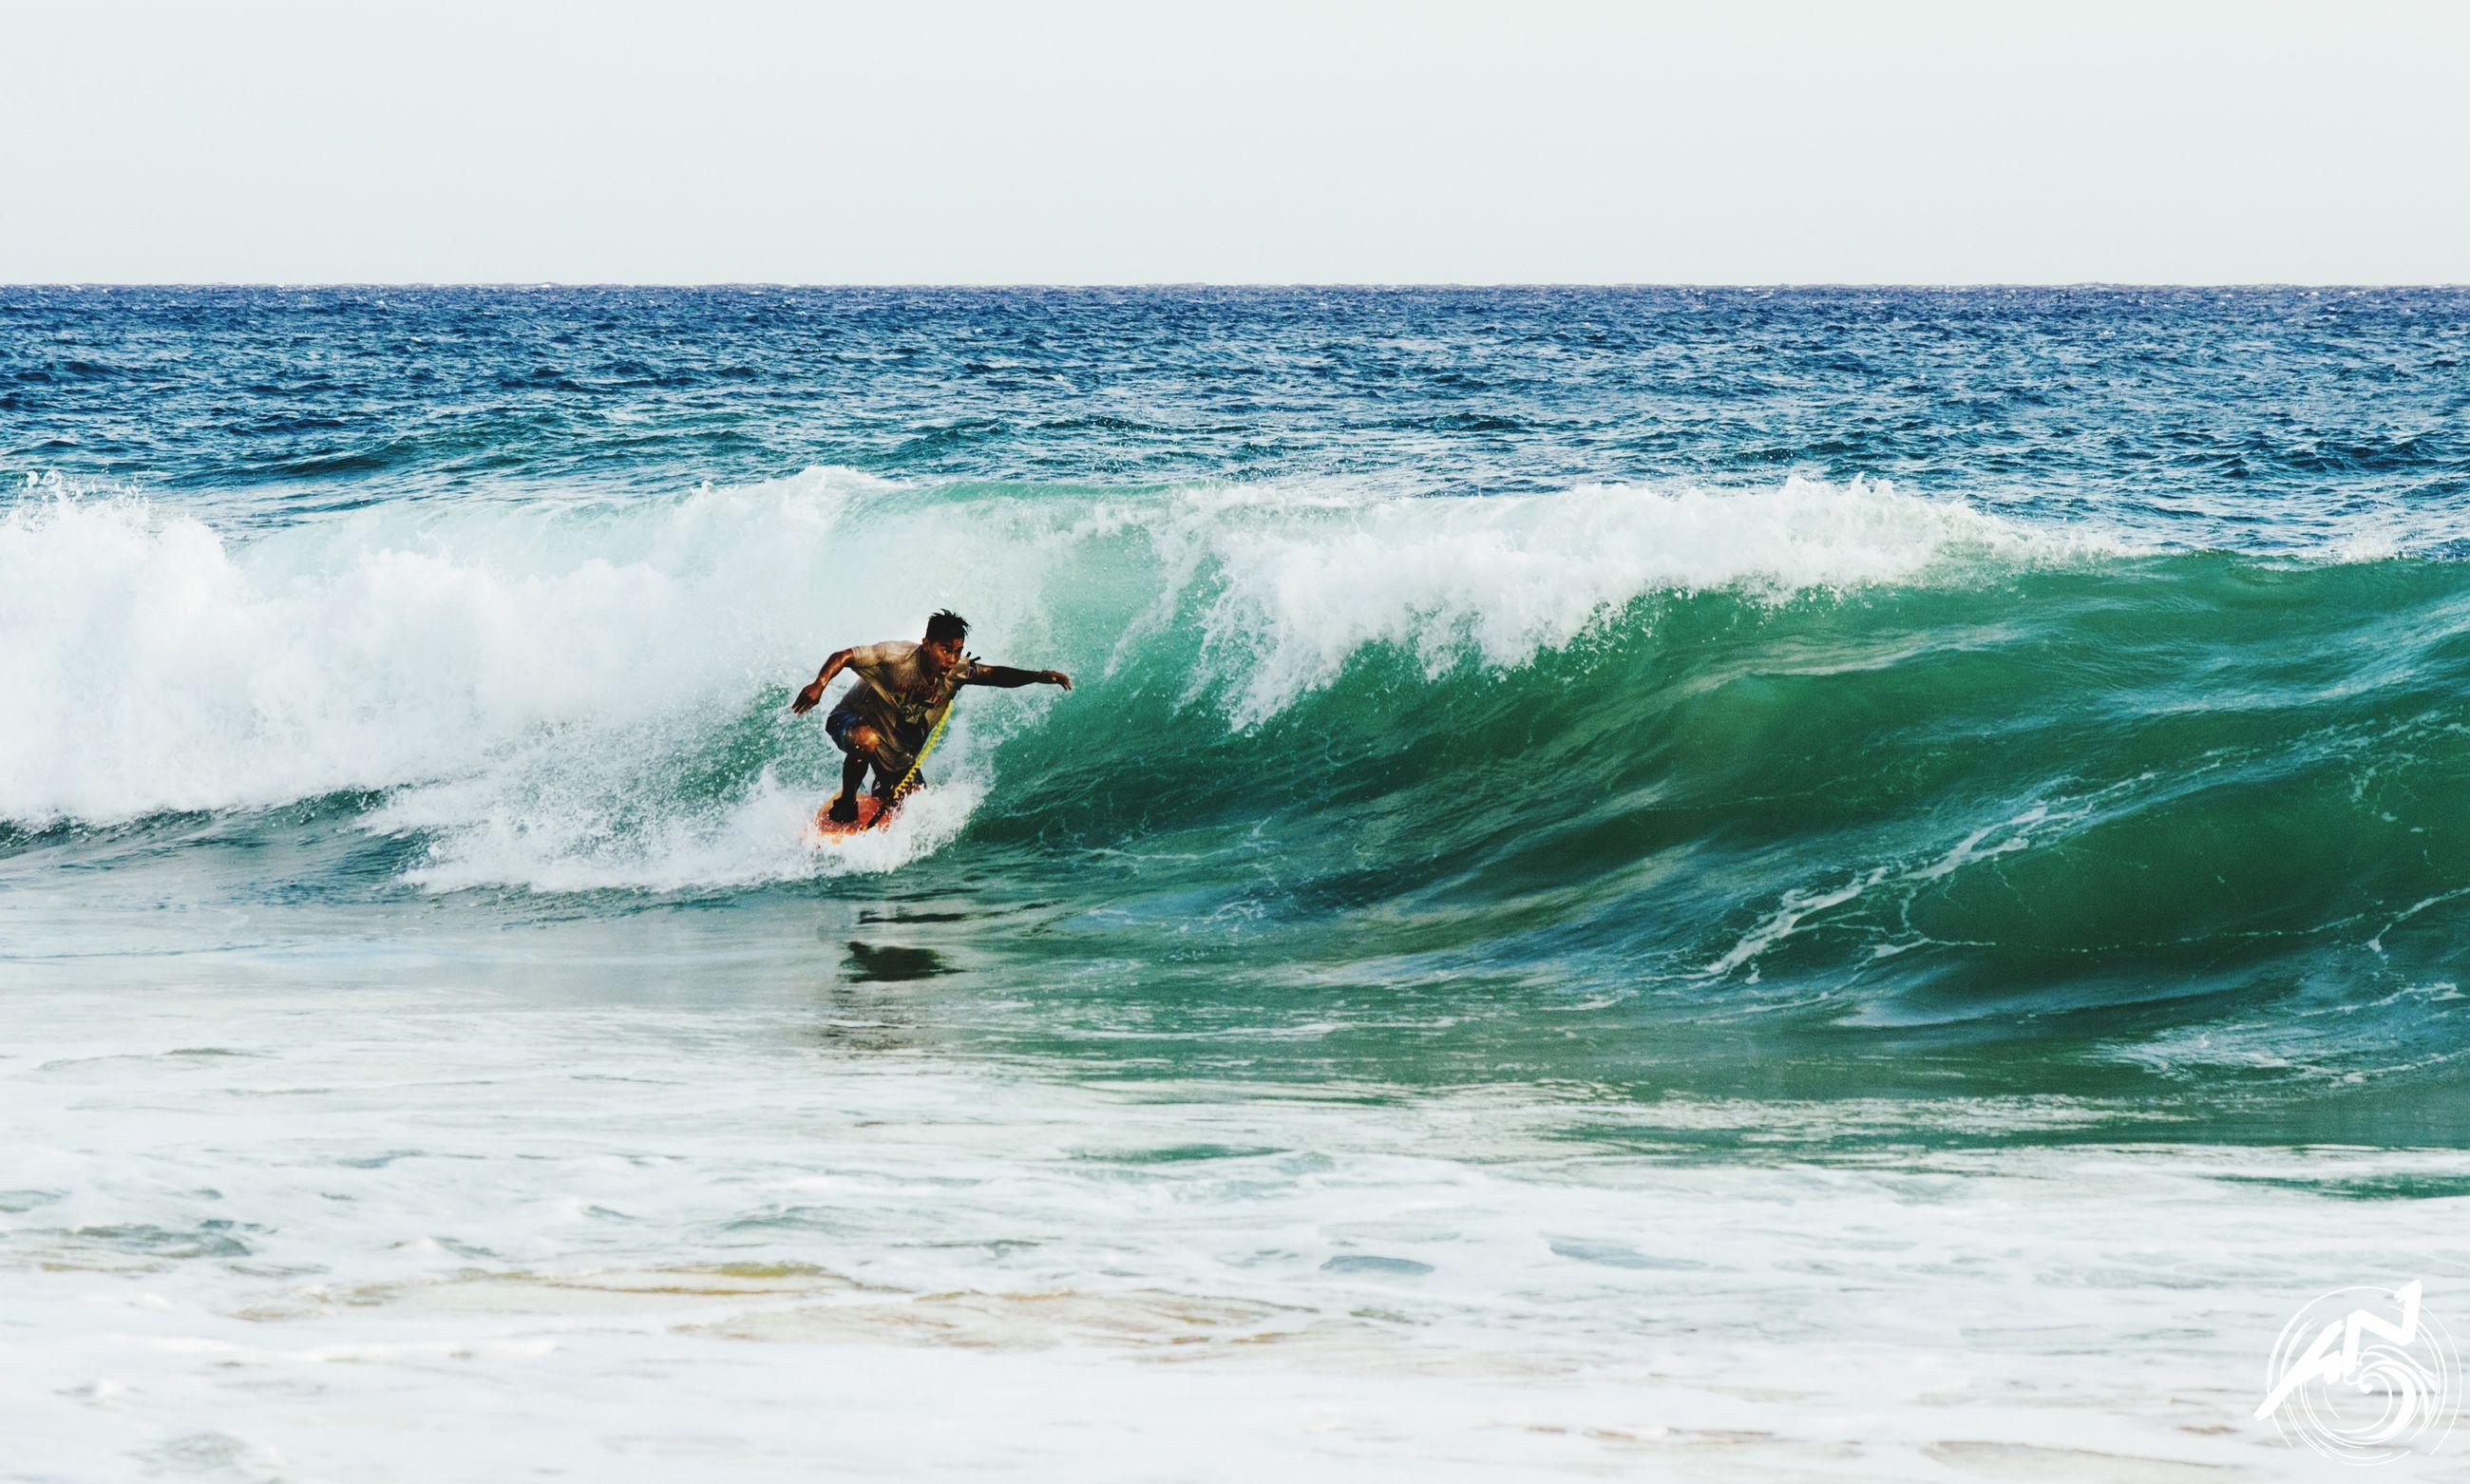 water, sea, leisure activity, lifestyles, wave, horizon over water, motion, men, surfboard, surf, vacations, waterfront, splashing, surfing, enjoyment, full length, water sport, sport